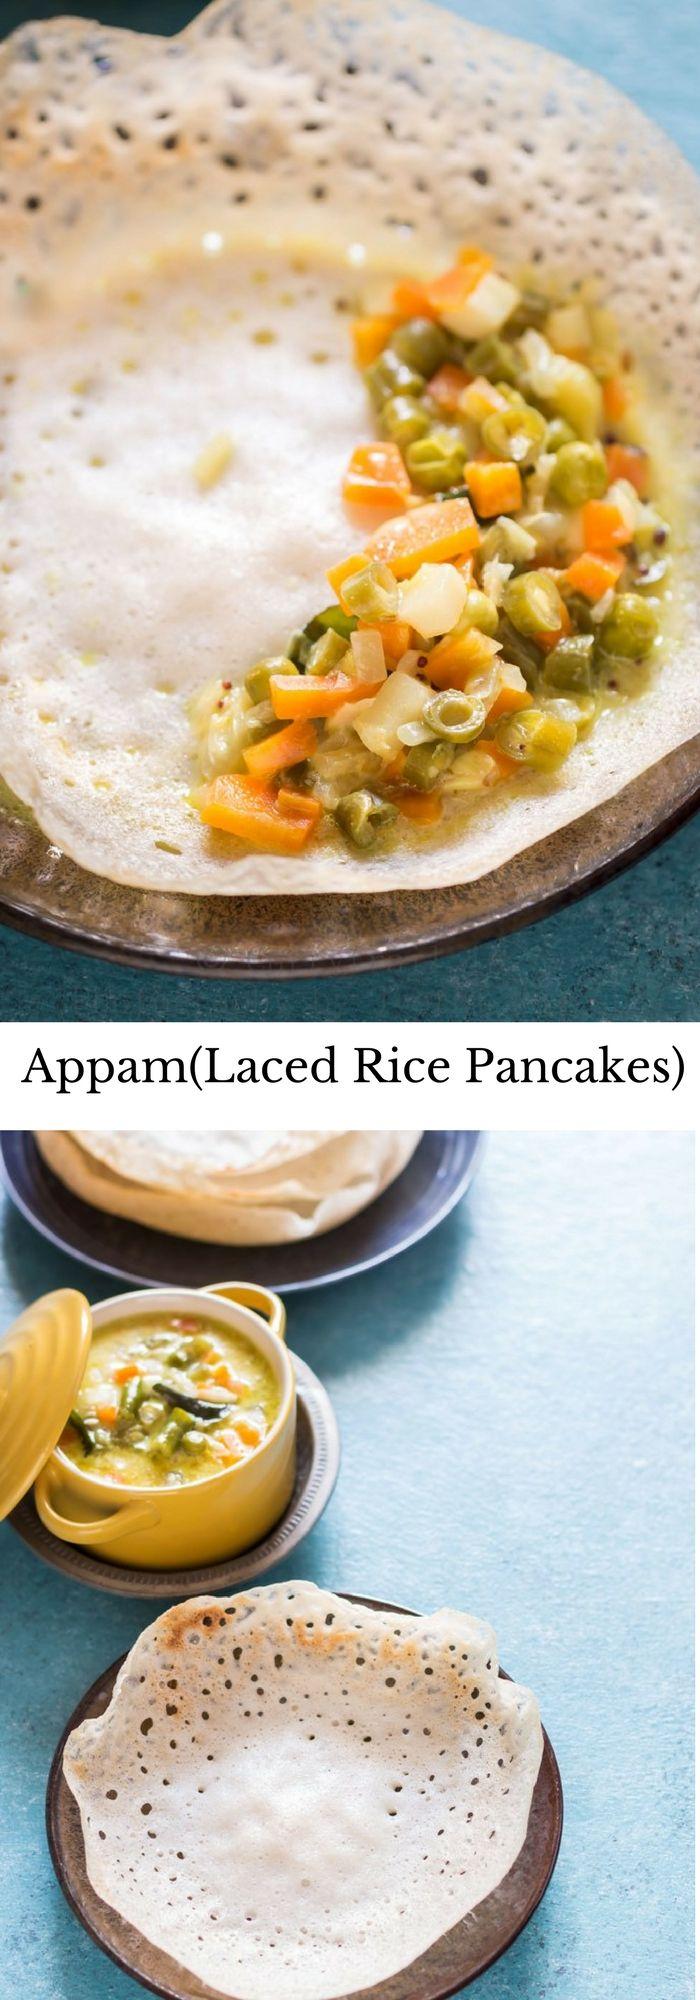 Kerala Appam Recipe with Yeast | Kerala's laced rice pancakes